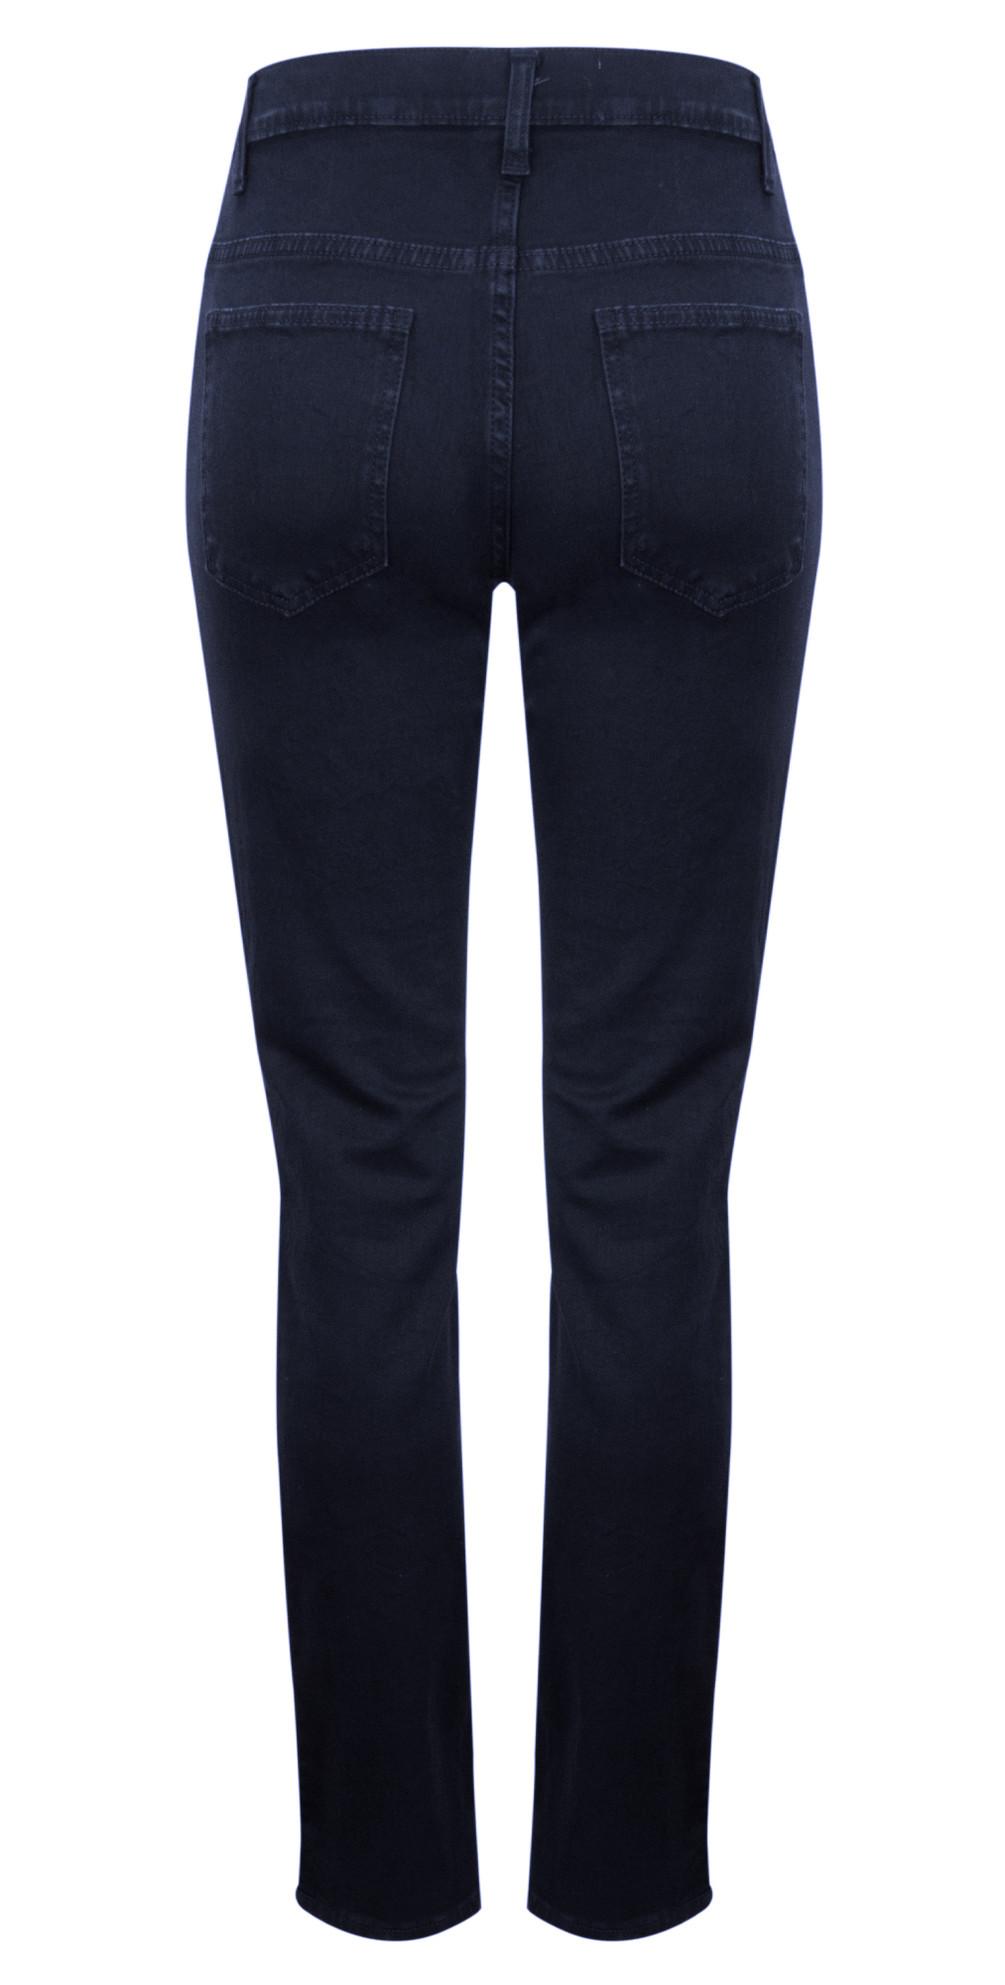 Moonlite 02 Straight Leg Jeans main image